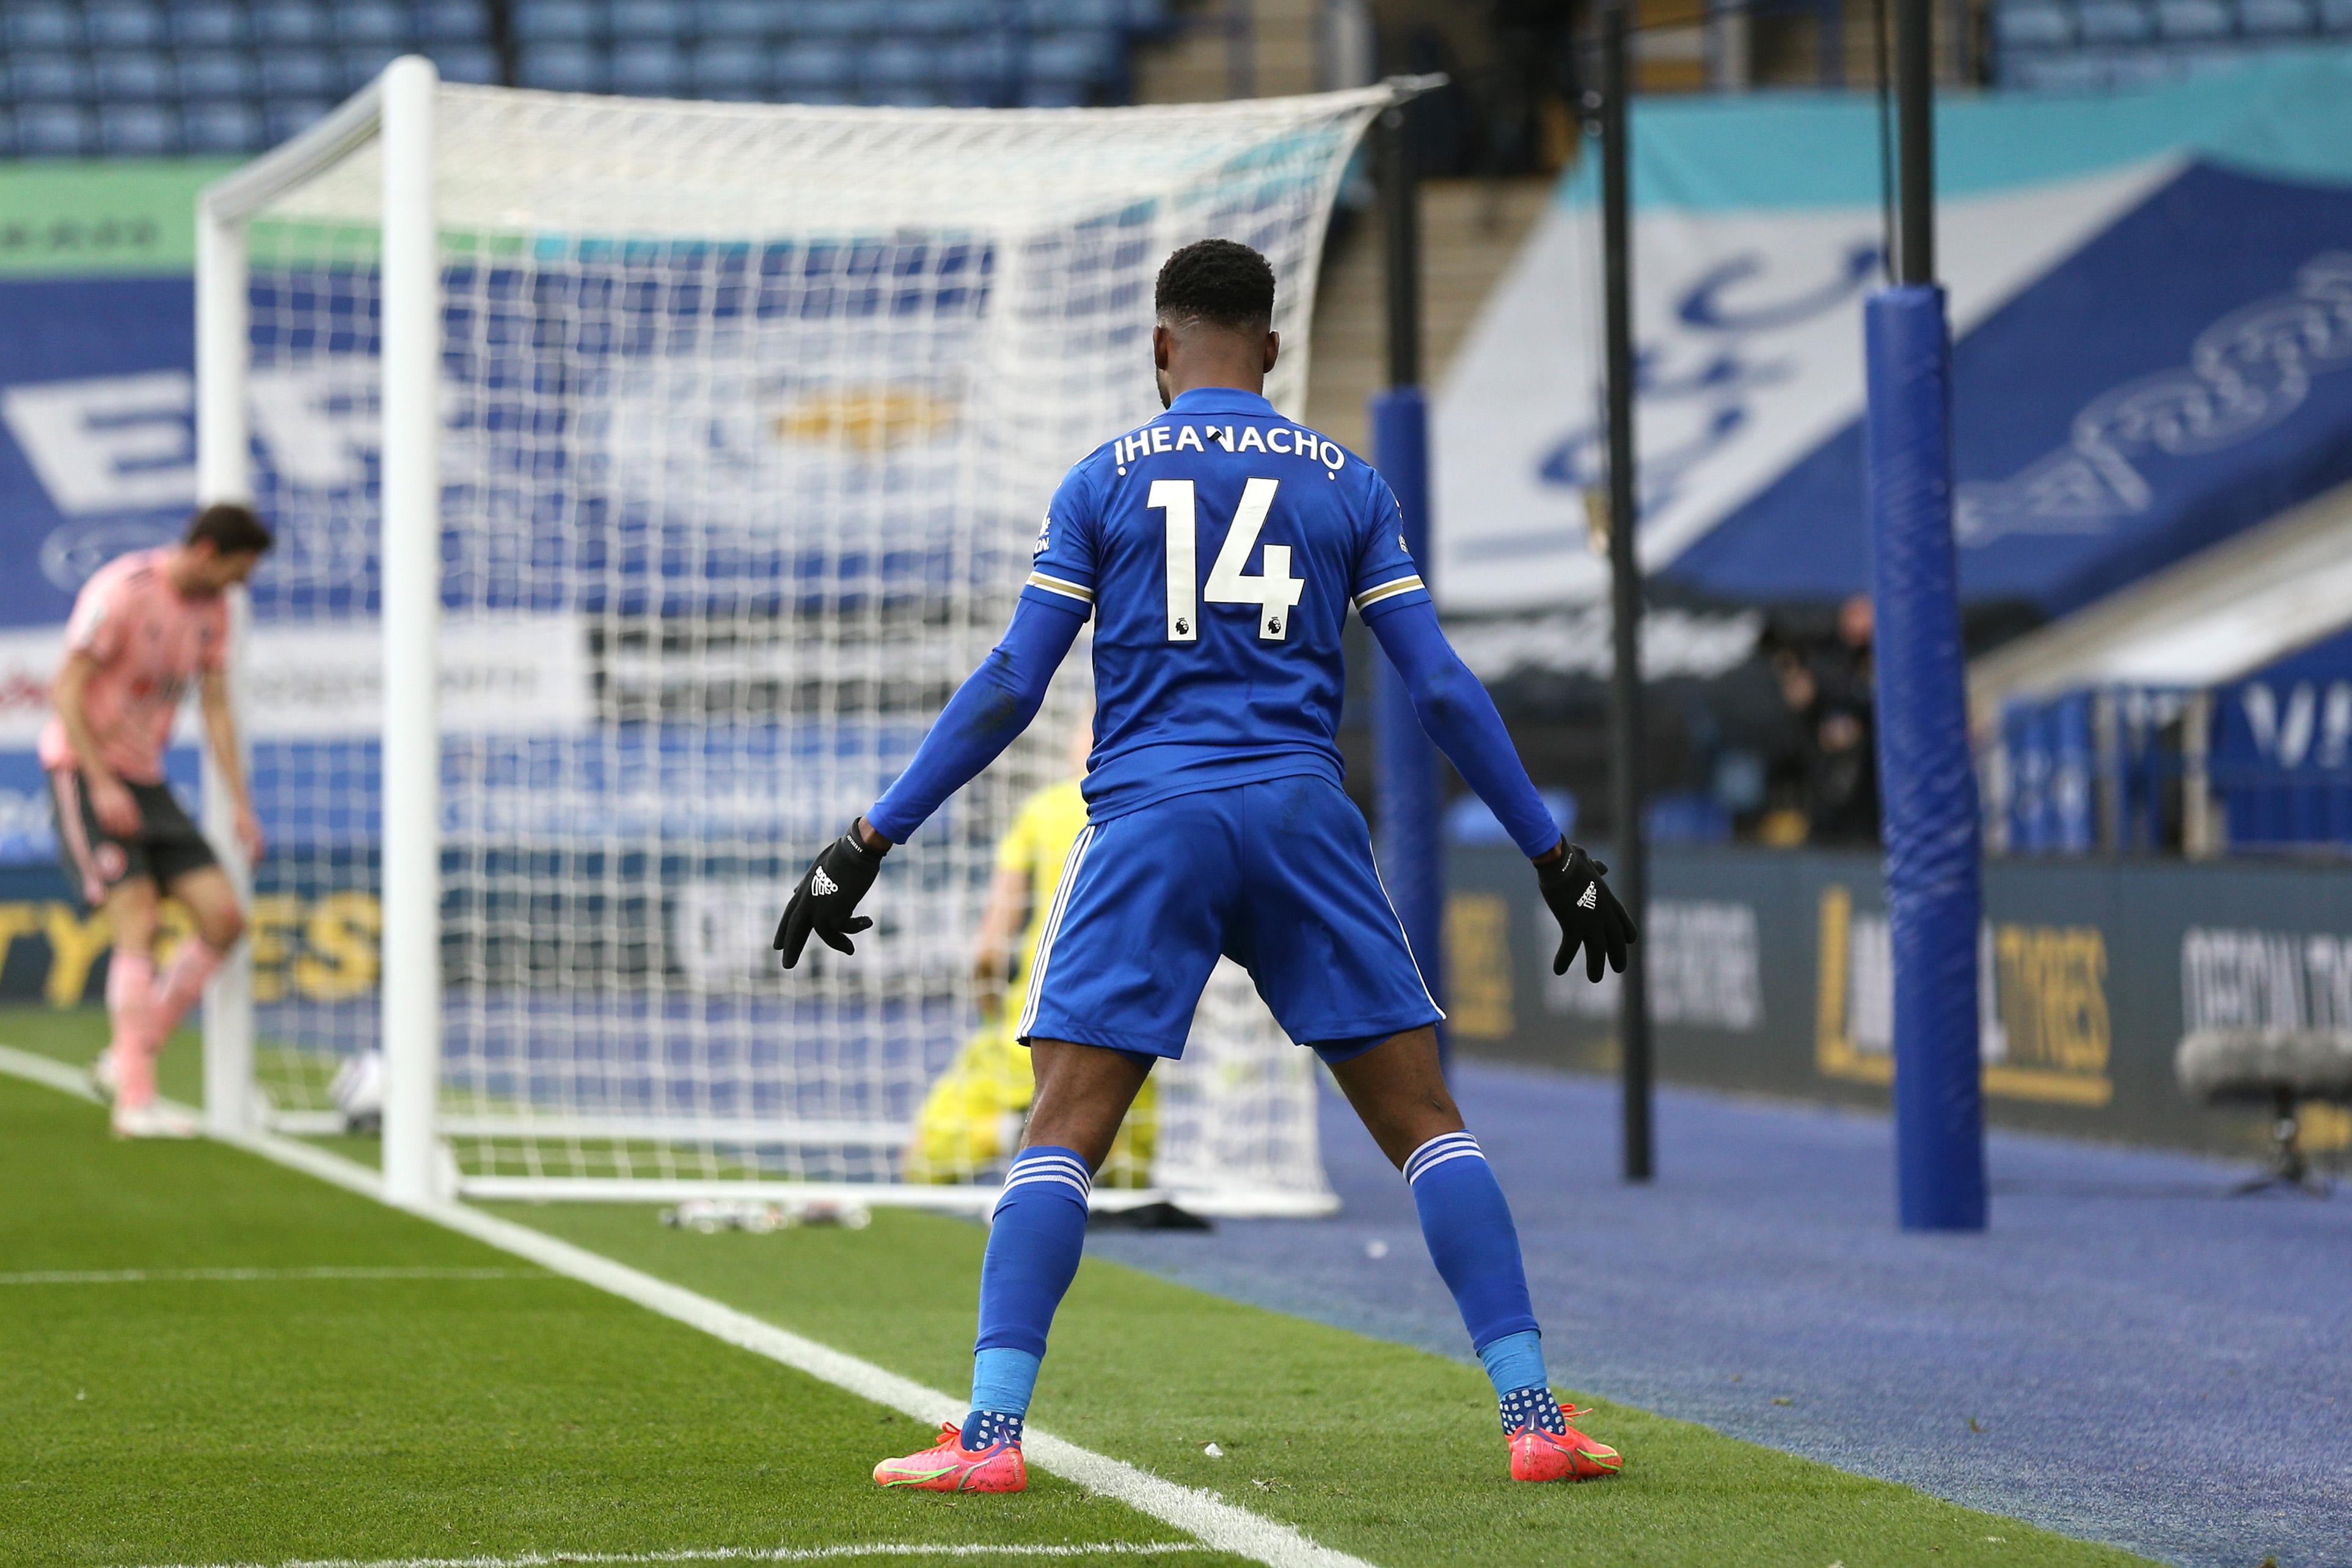 Leicester City v Sheffield United - Premier League